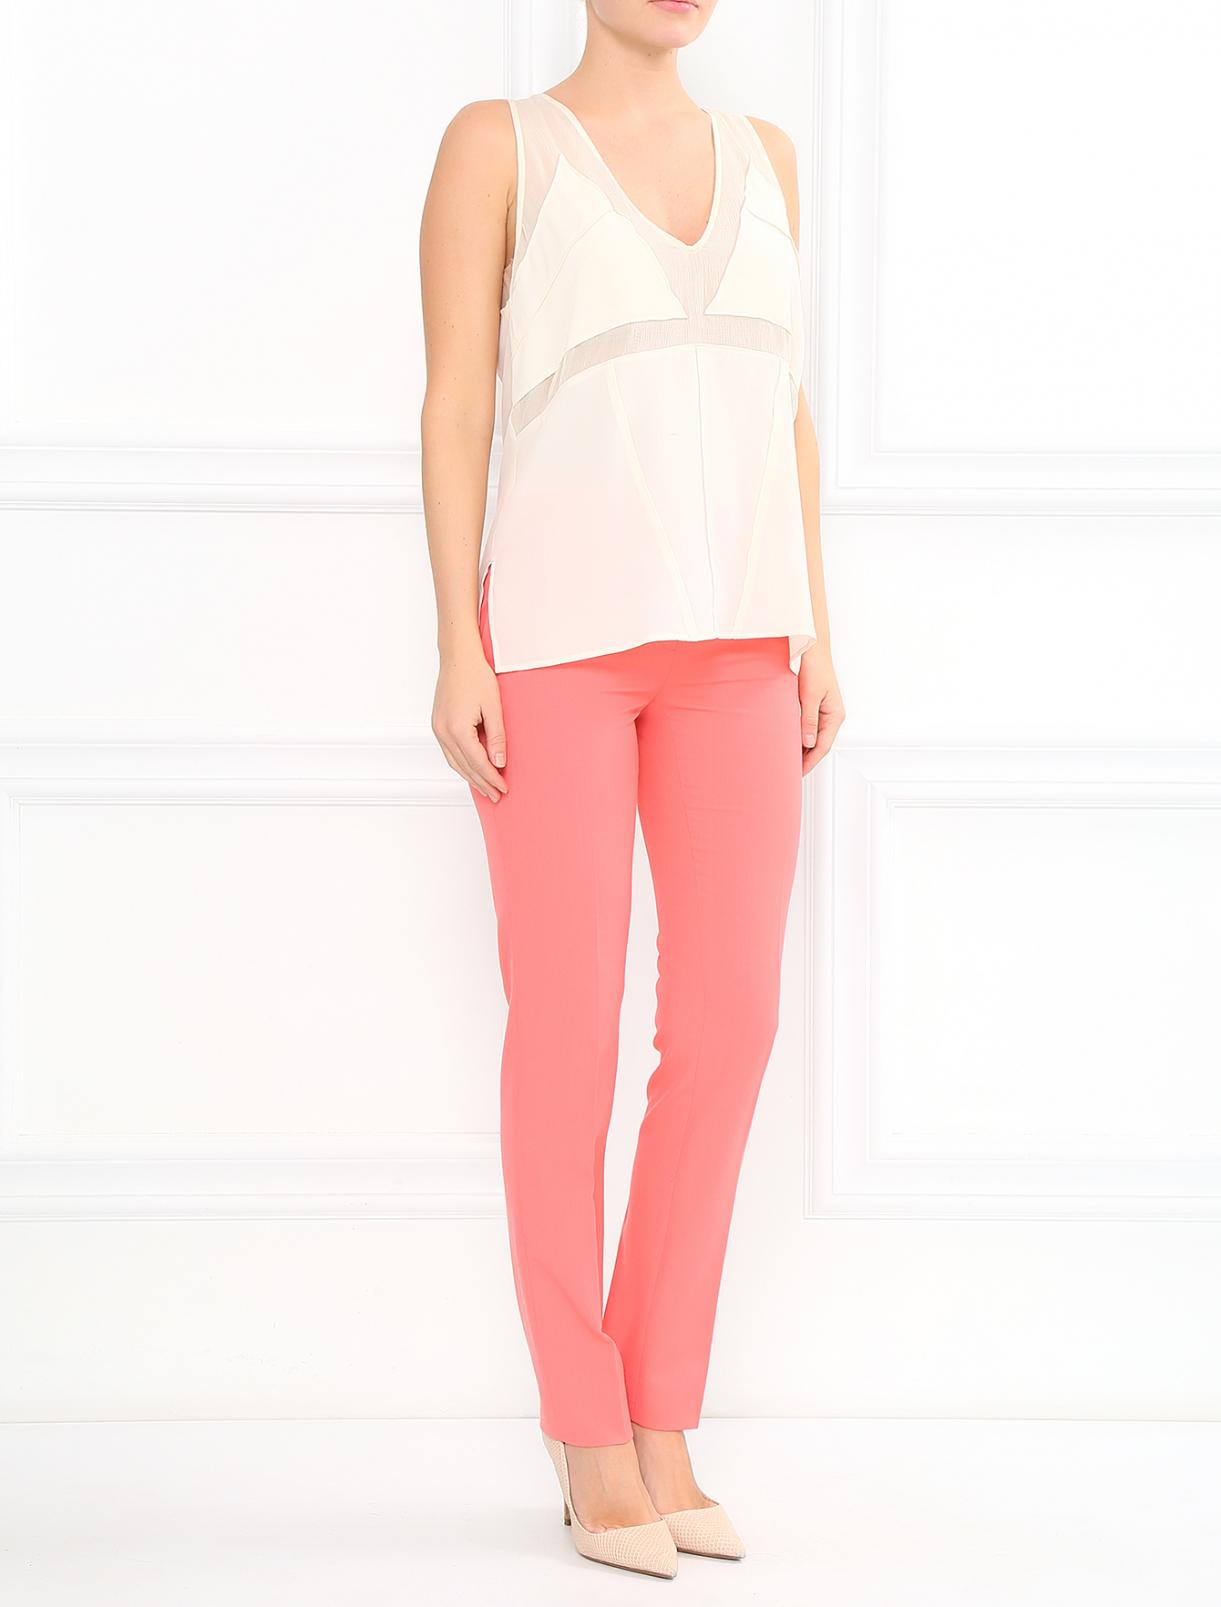 Узкие брюки со стрелками Moschino Cheap&Chic  –  Модель Общий вид